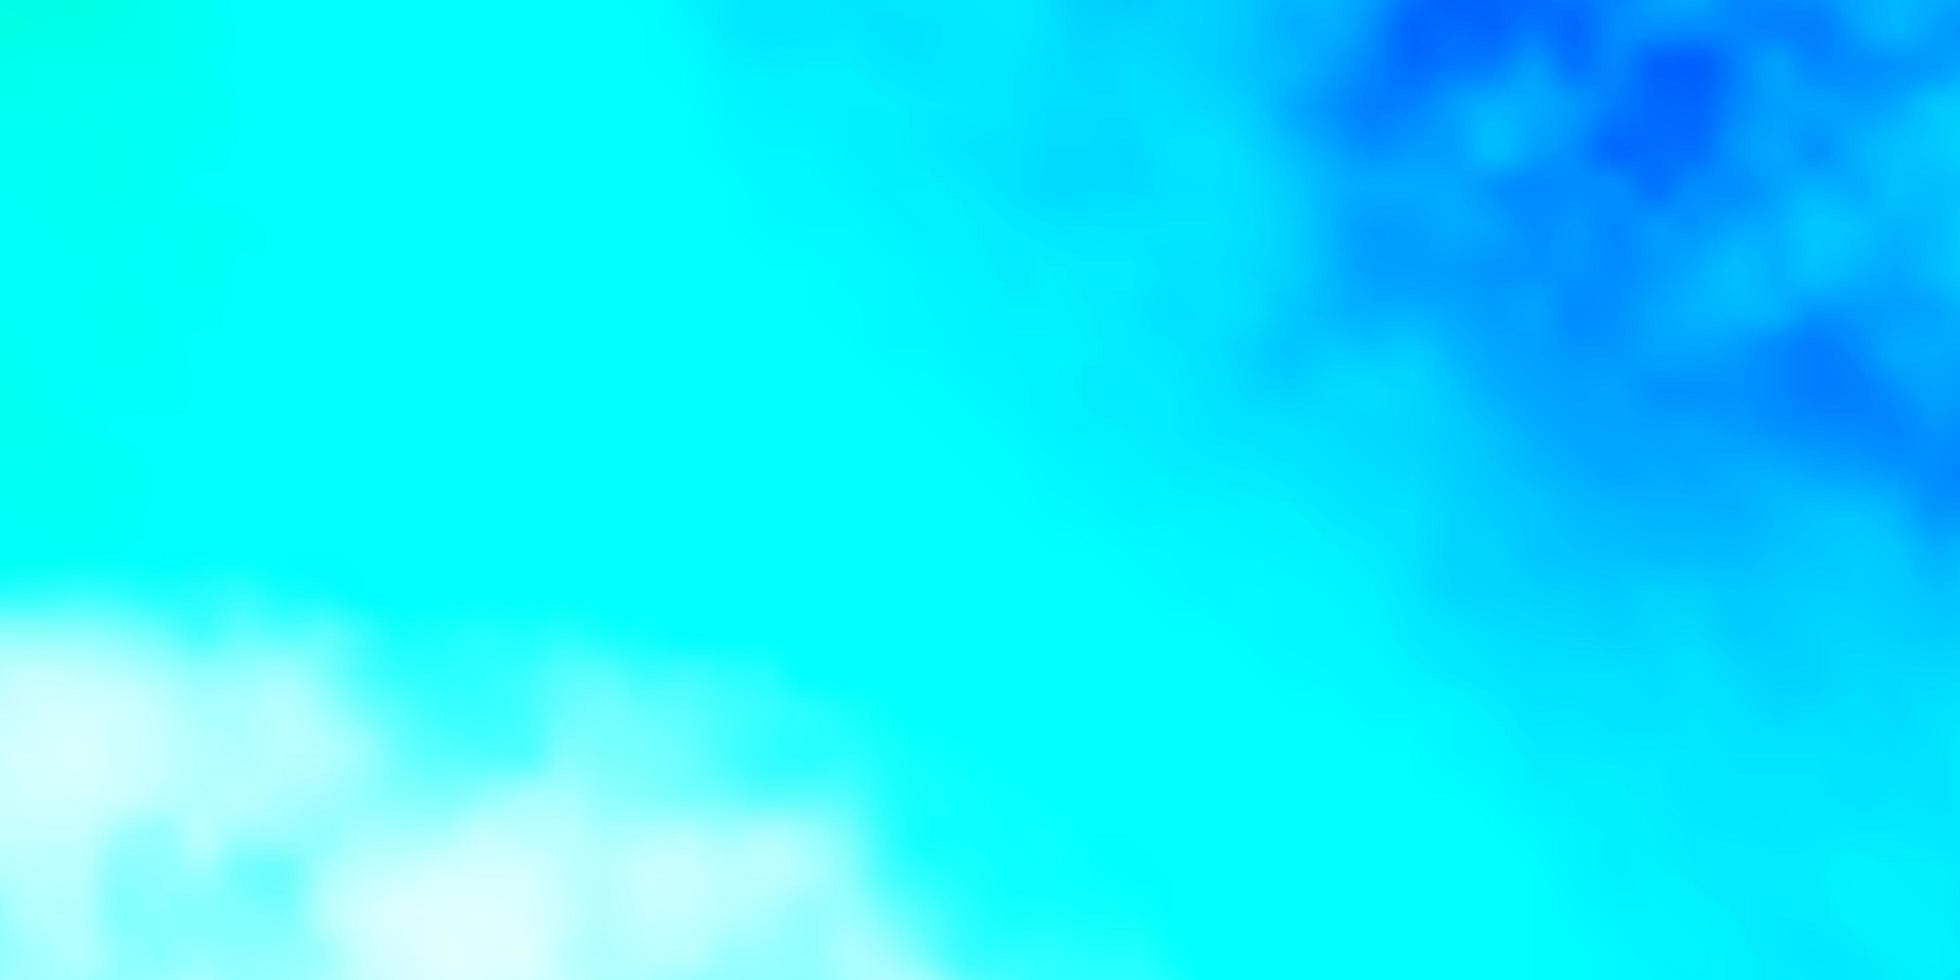 layout de vetor de azul claro e verde com cloudscape.